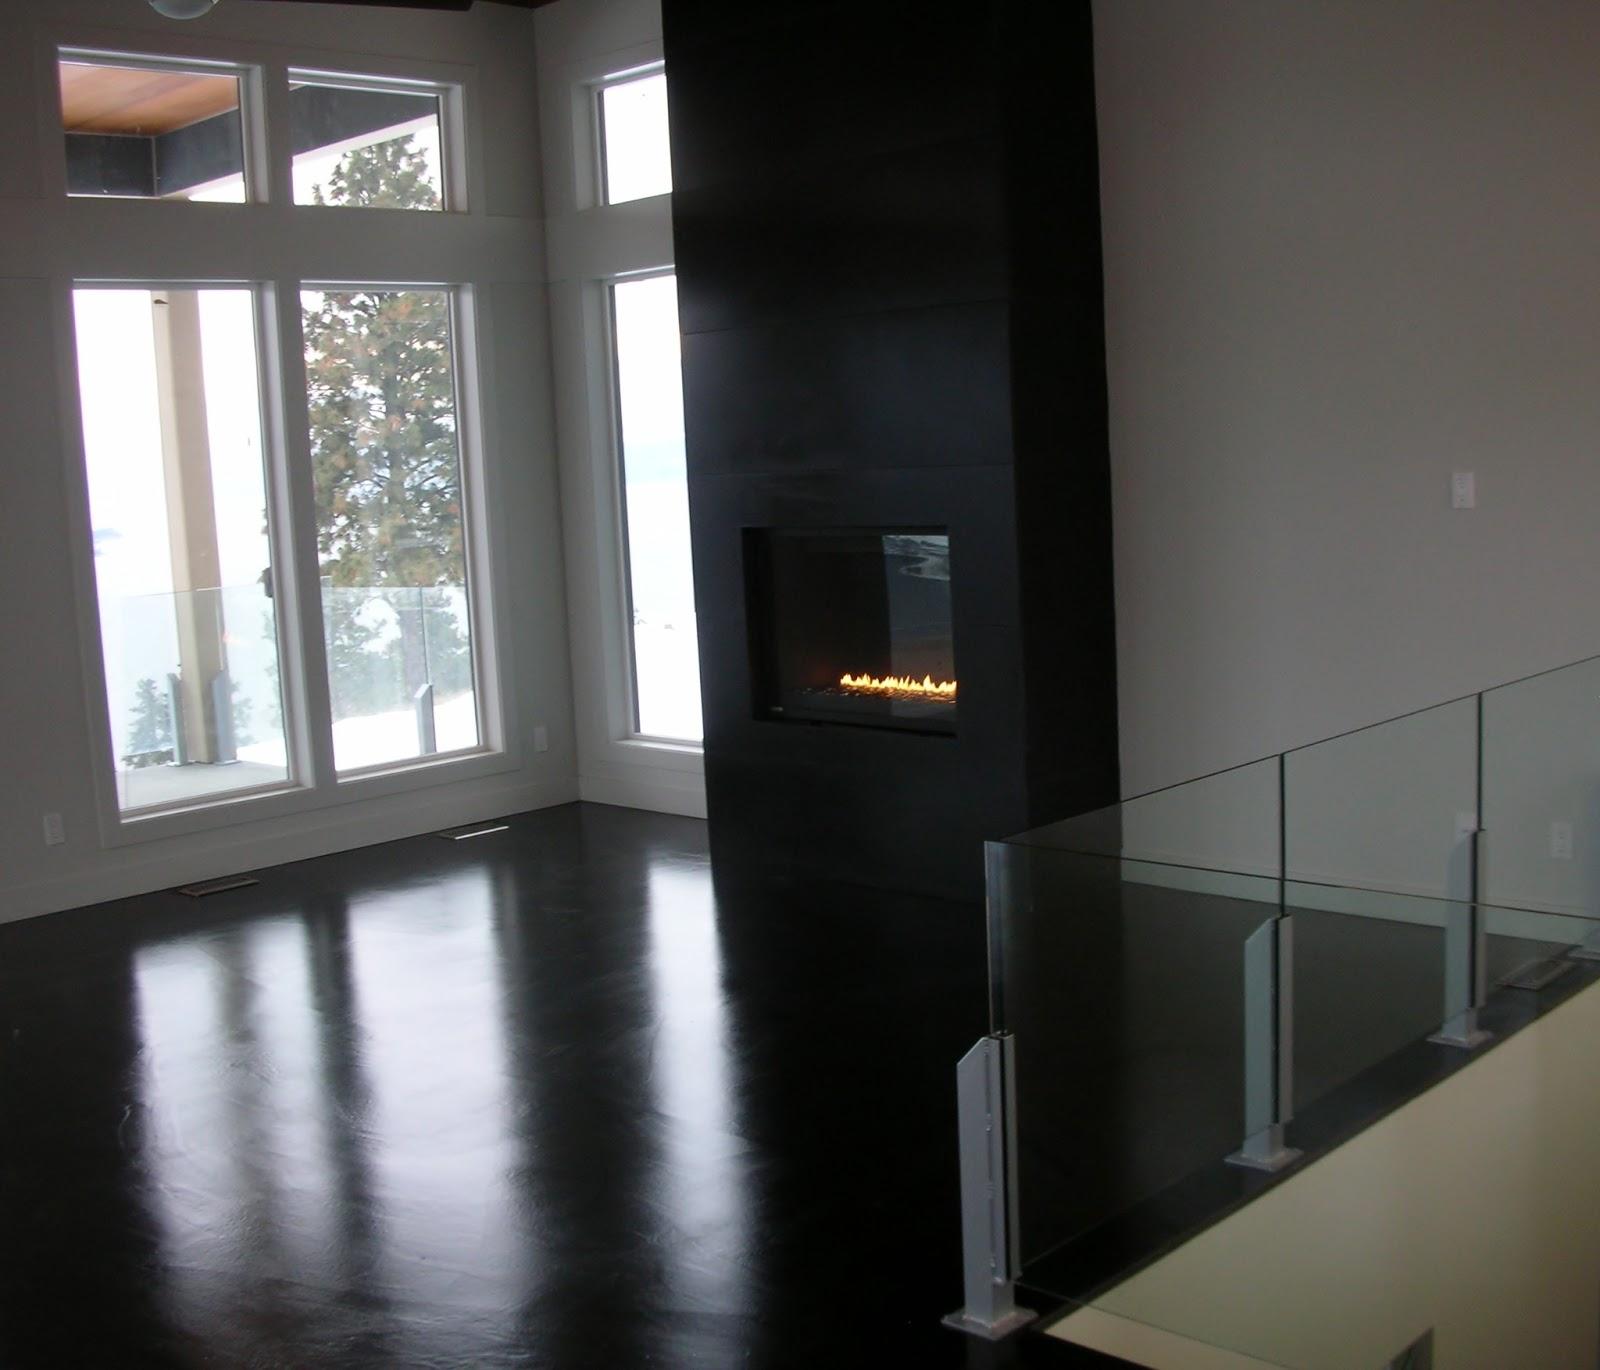 MODE CONCRETE: Modern and Super Cool Black Concrete Floor